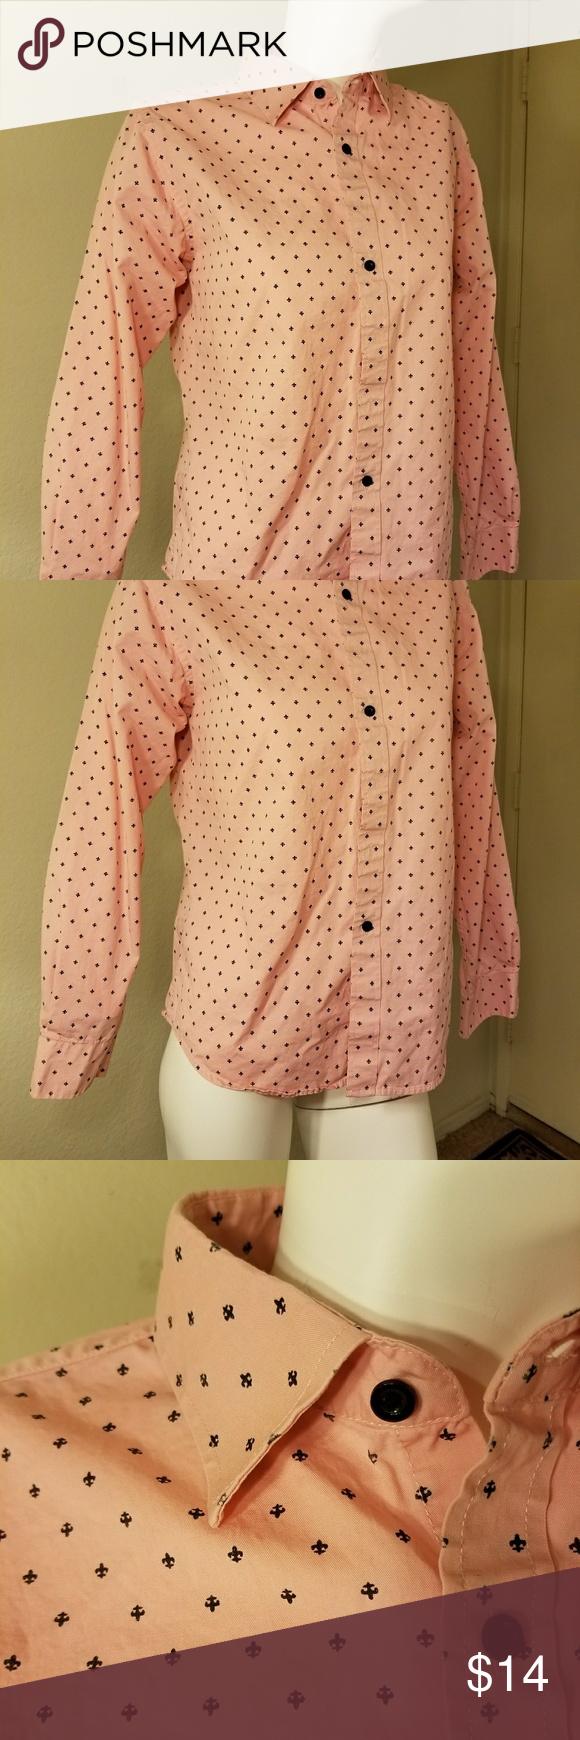 Pink dress shirt for women  BUNDLE AND SAVEPink dress shirt